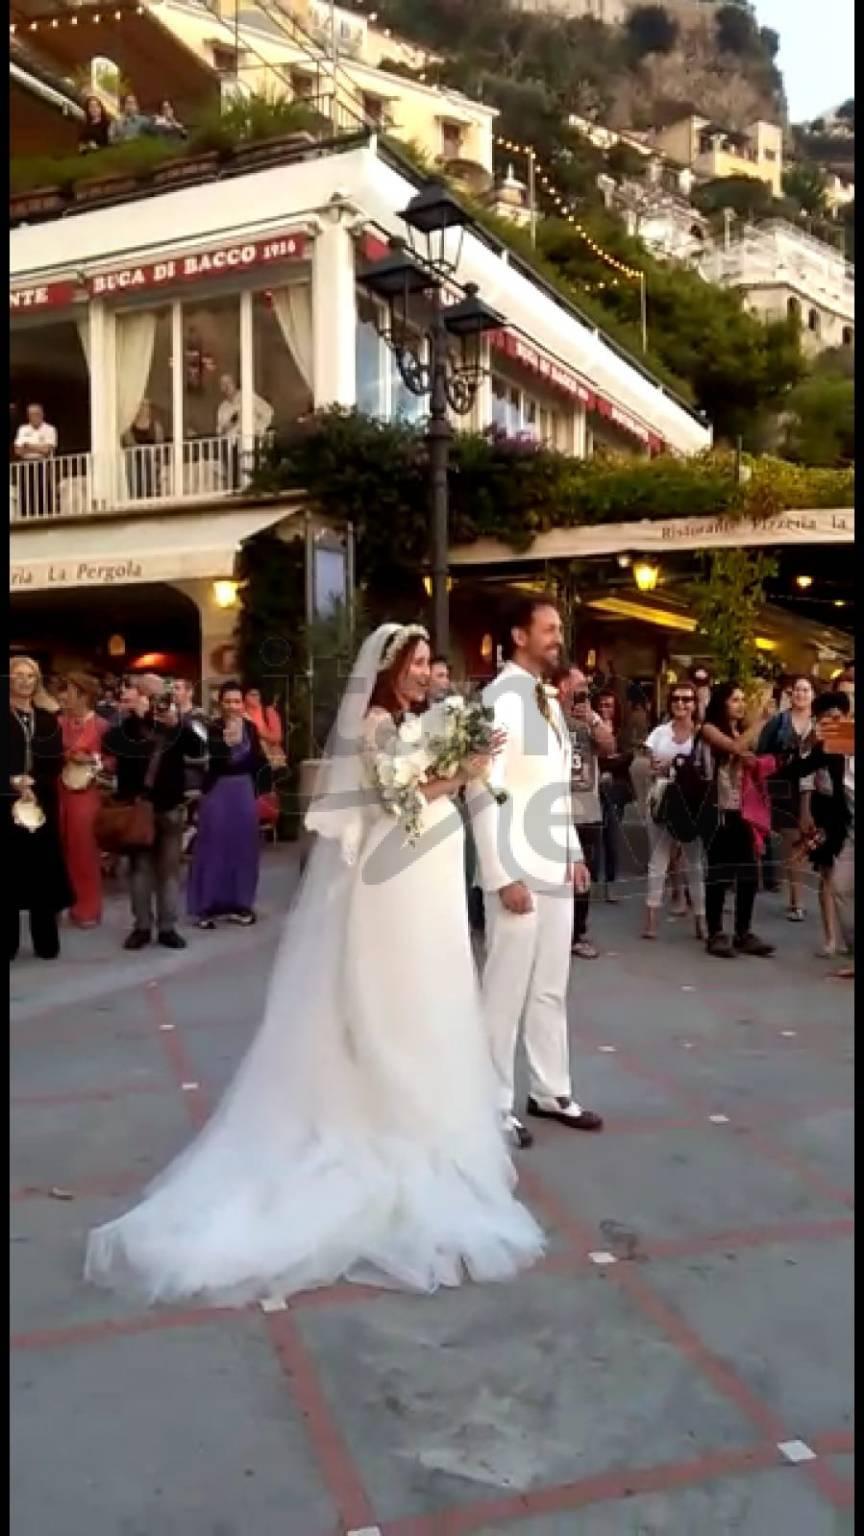 matrimonio-ilenia-lazzarin-roberto-palmieri-3234776